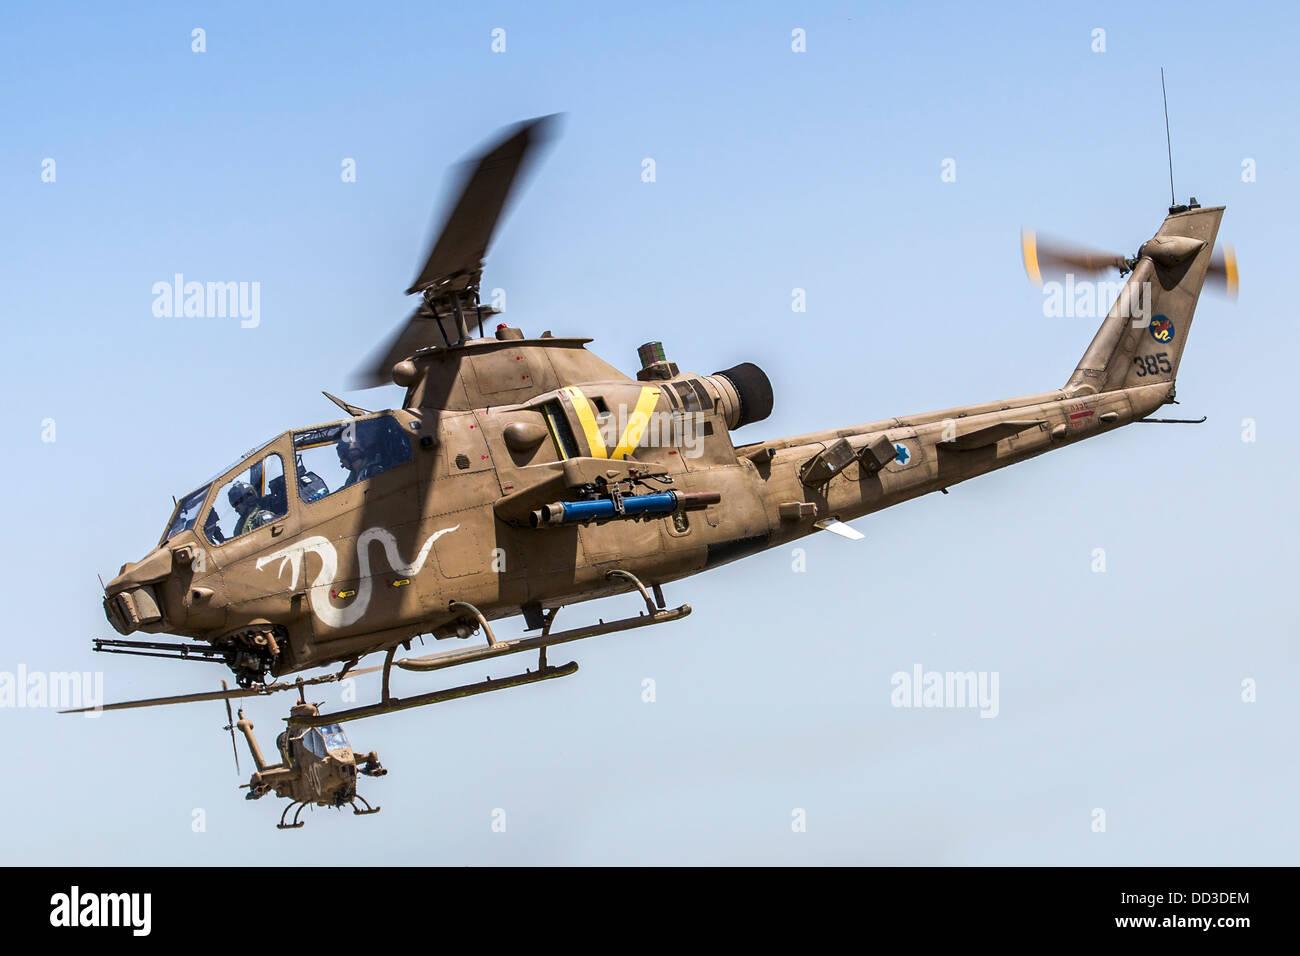 Israeli Air force (IAF) helicopter, Bell AH-1 Cobra in flight ...